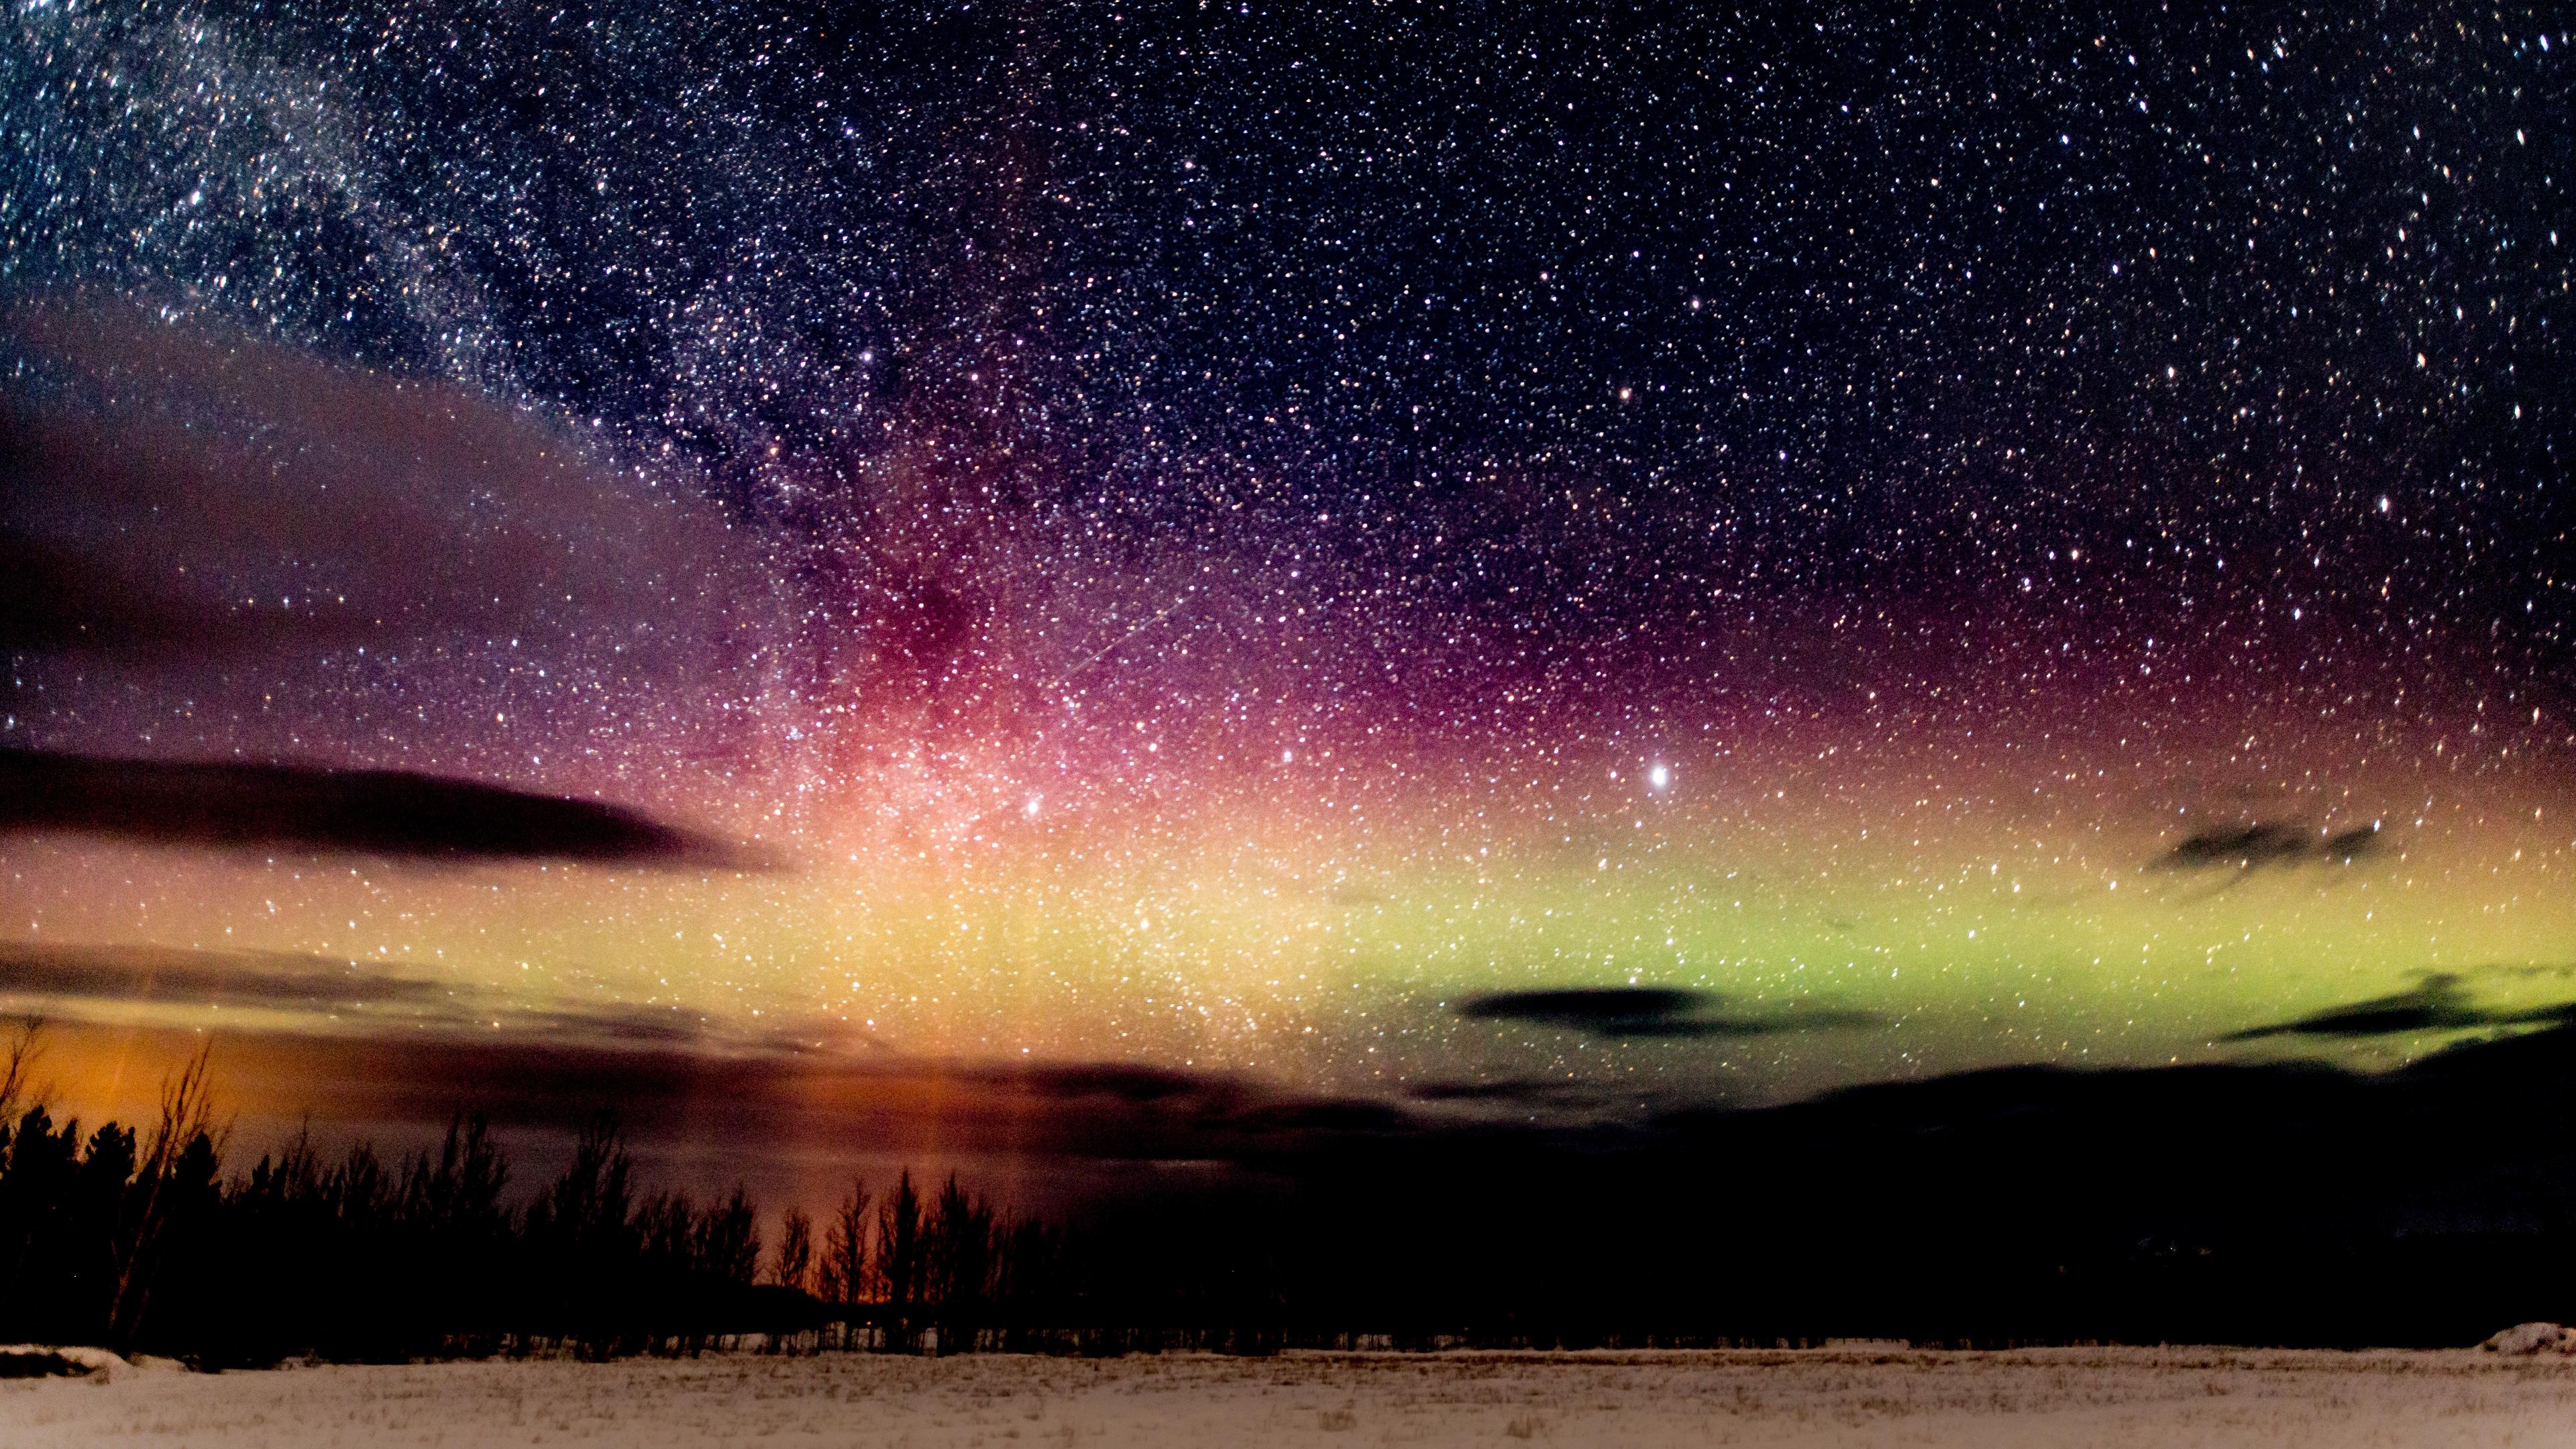 starry sky night stars glitter 4k 1541116585 - starry sky, night, stars, glitter 4k - Stars, starry sky, Night